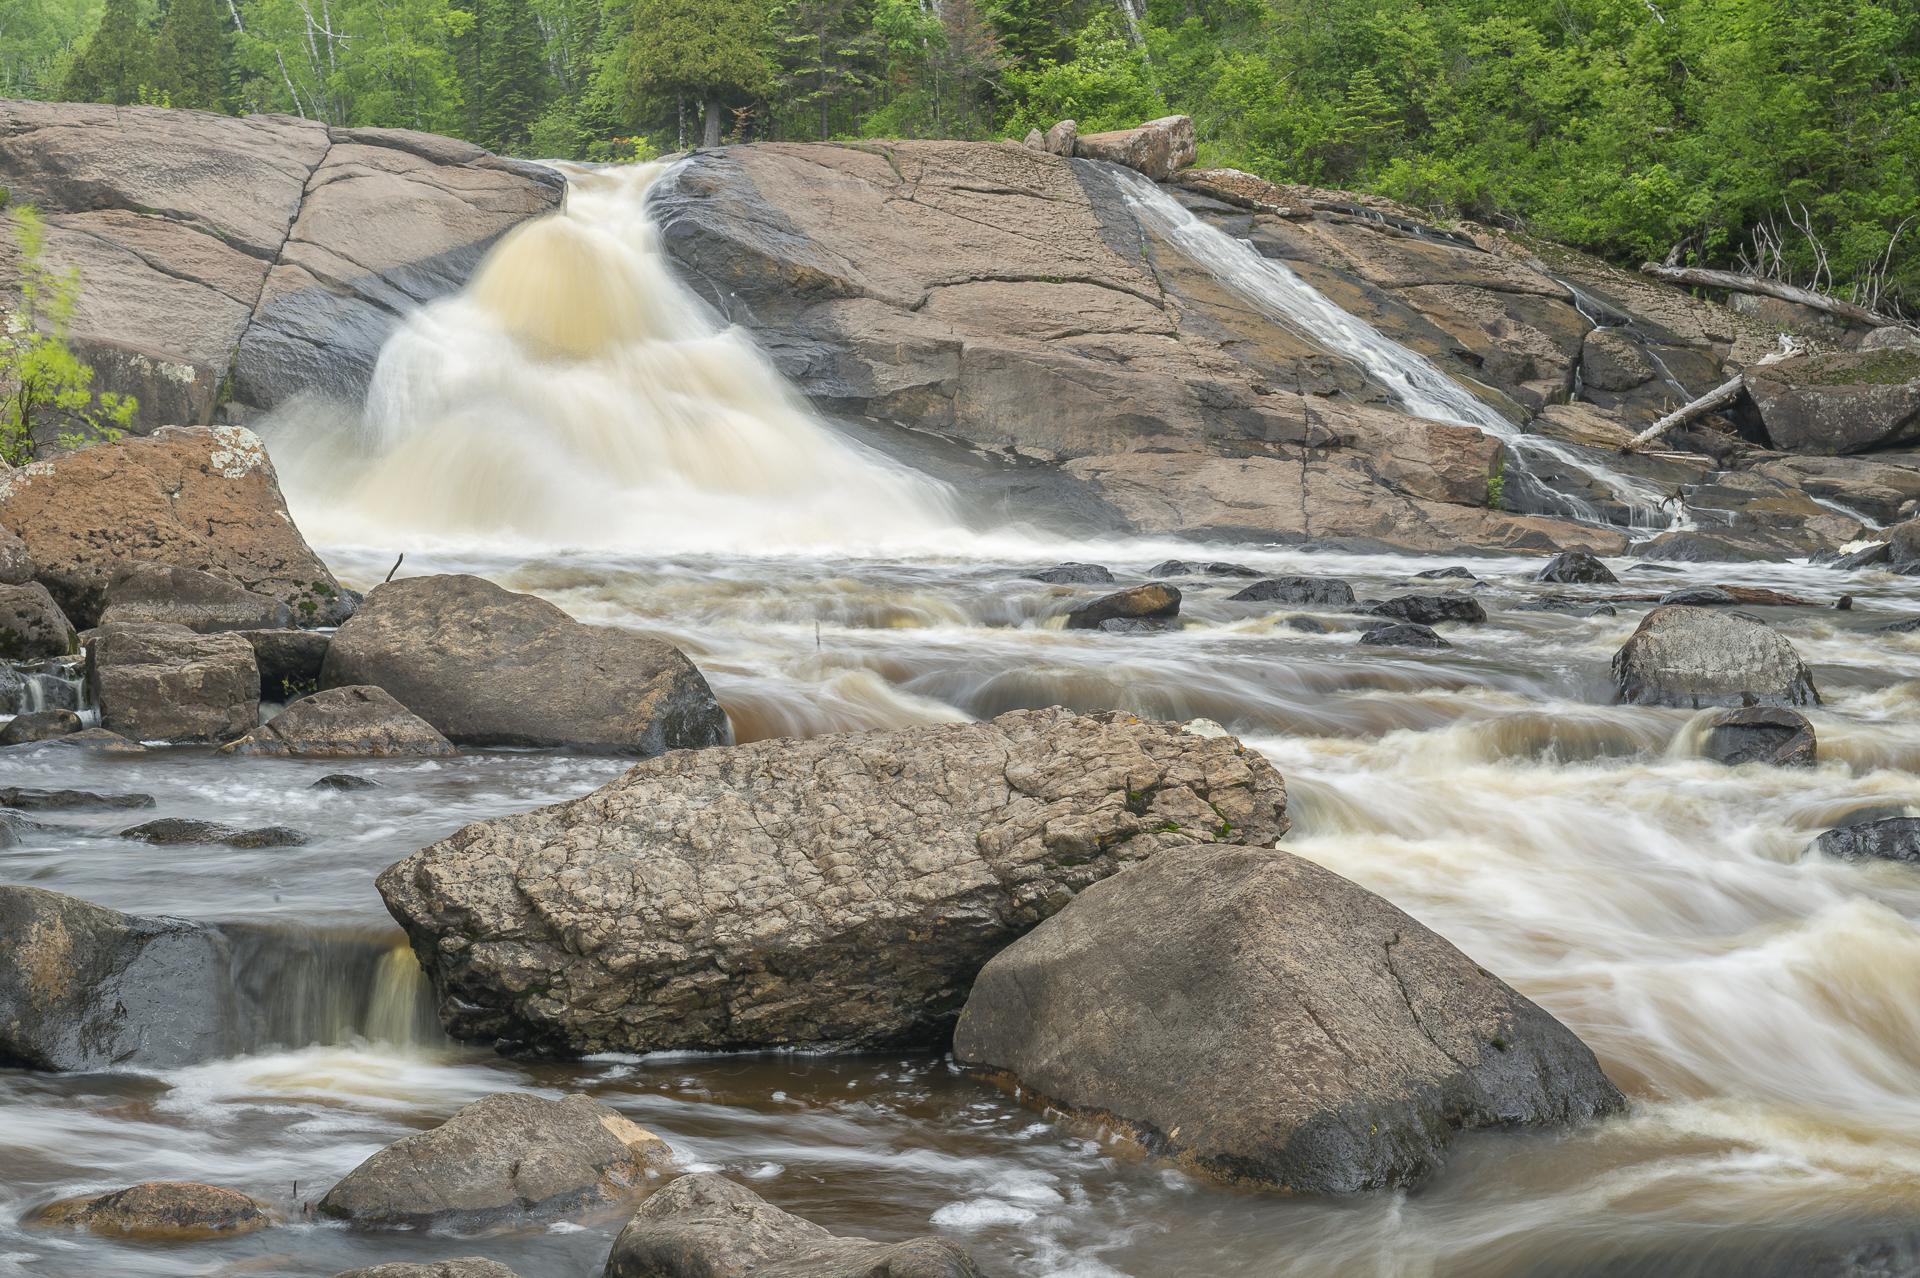 Swollen Beaver River